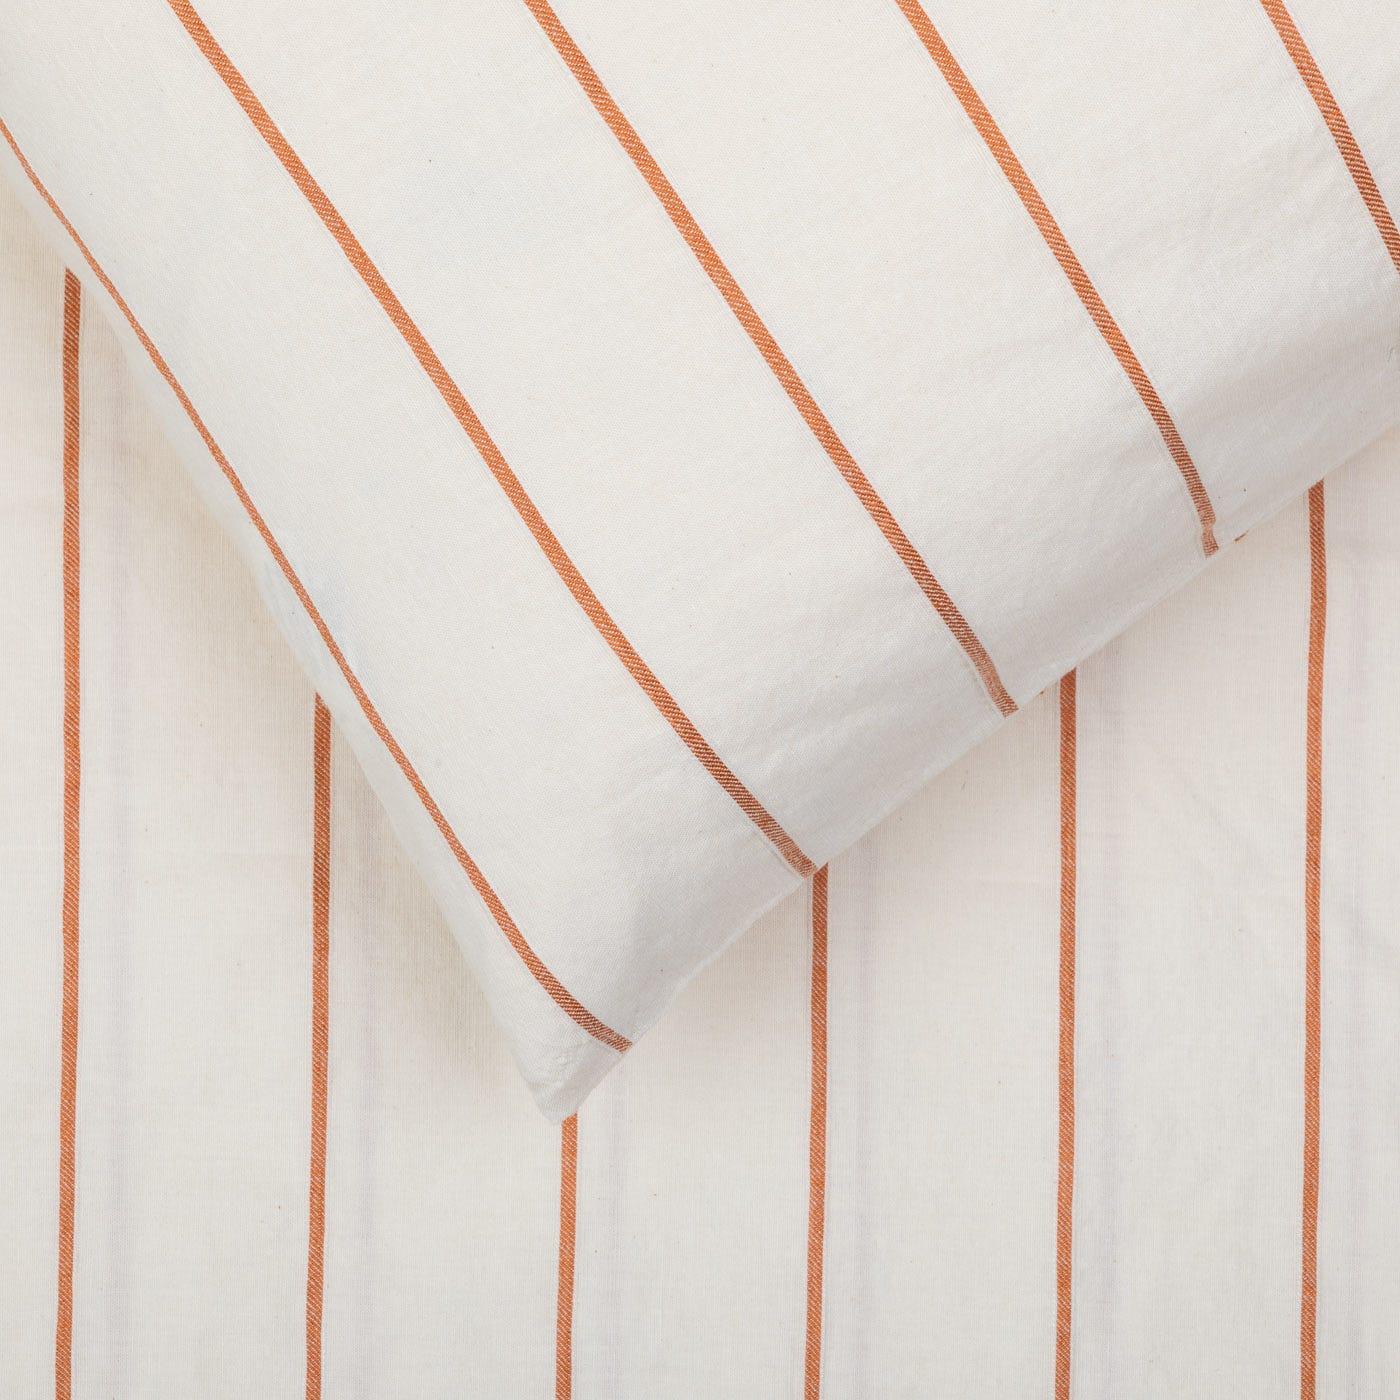 Washed Stripe Pillowcase set of 2